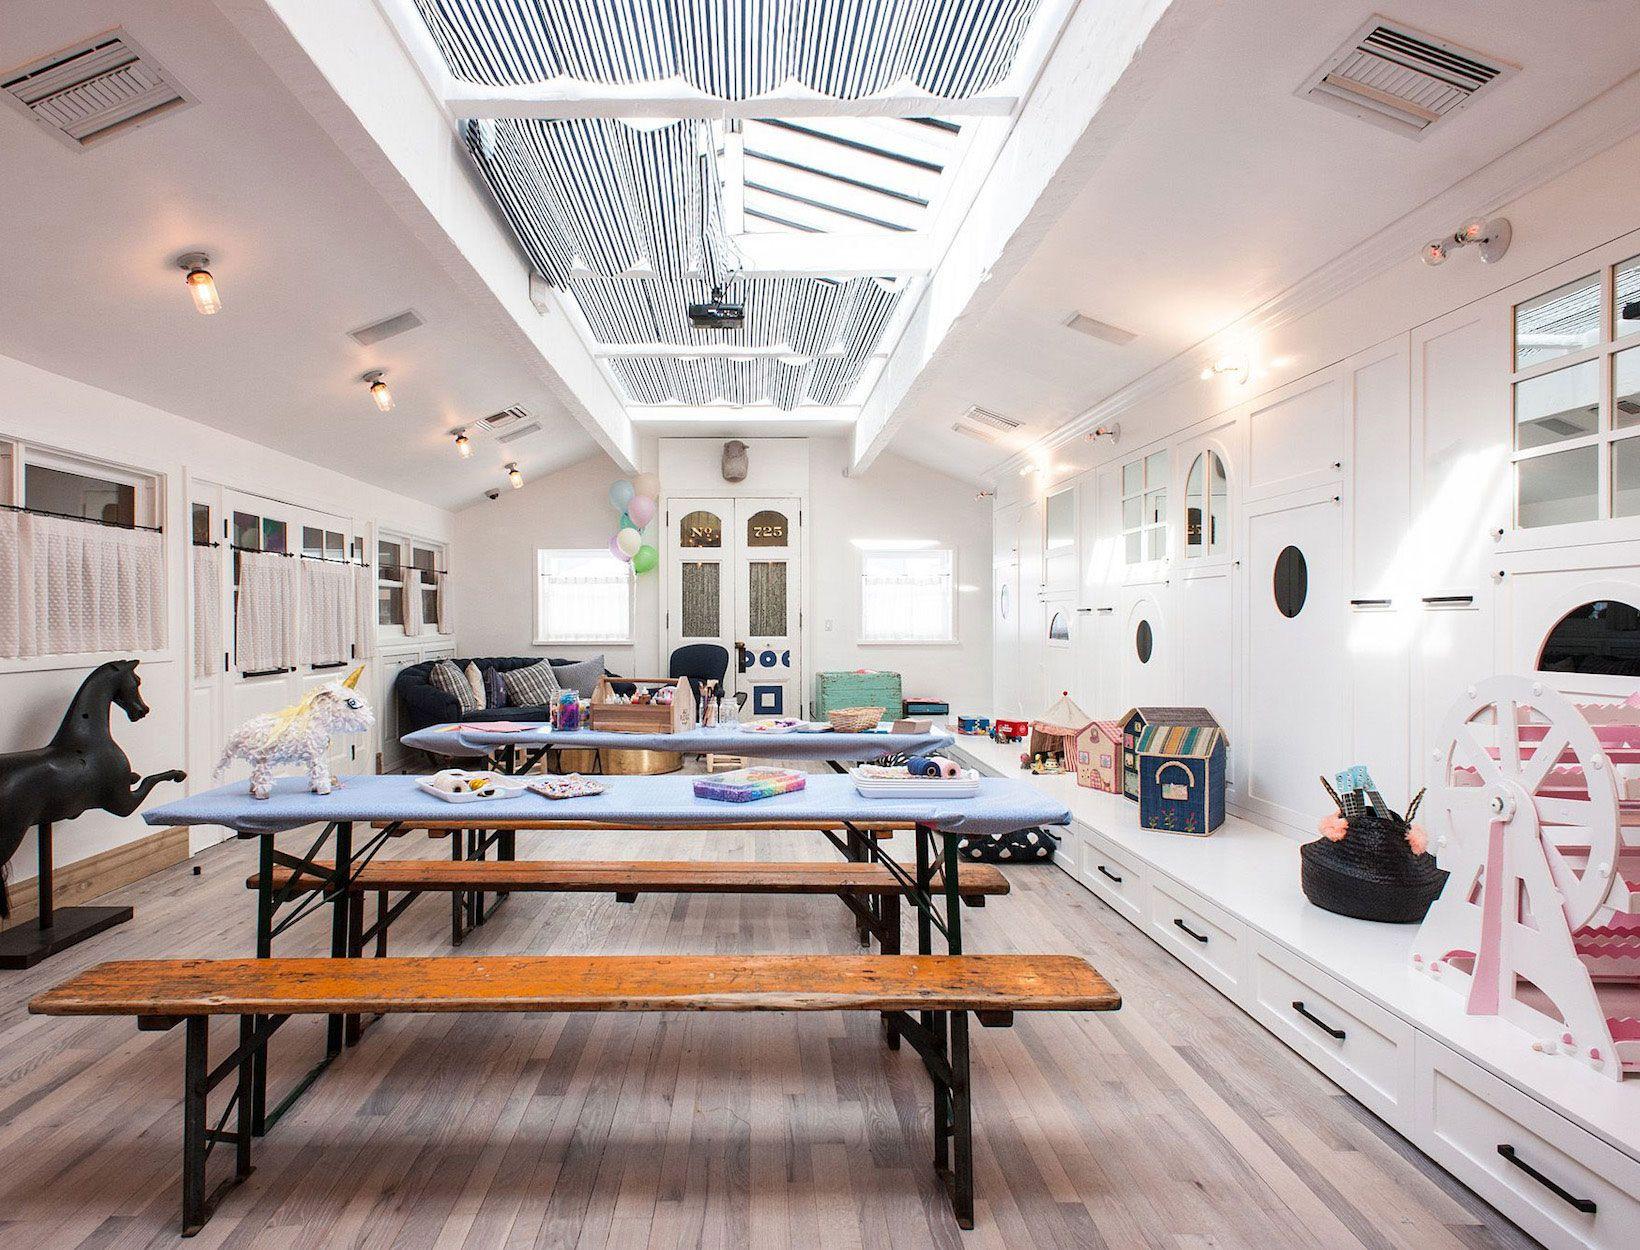 15 Restaurants For Kid Friendly Carryout In Los Angeles Kid Friendly Restaurants Los Angeles With Kids Kids Restaurants